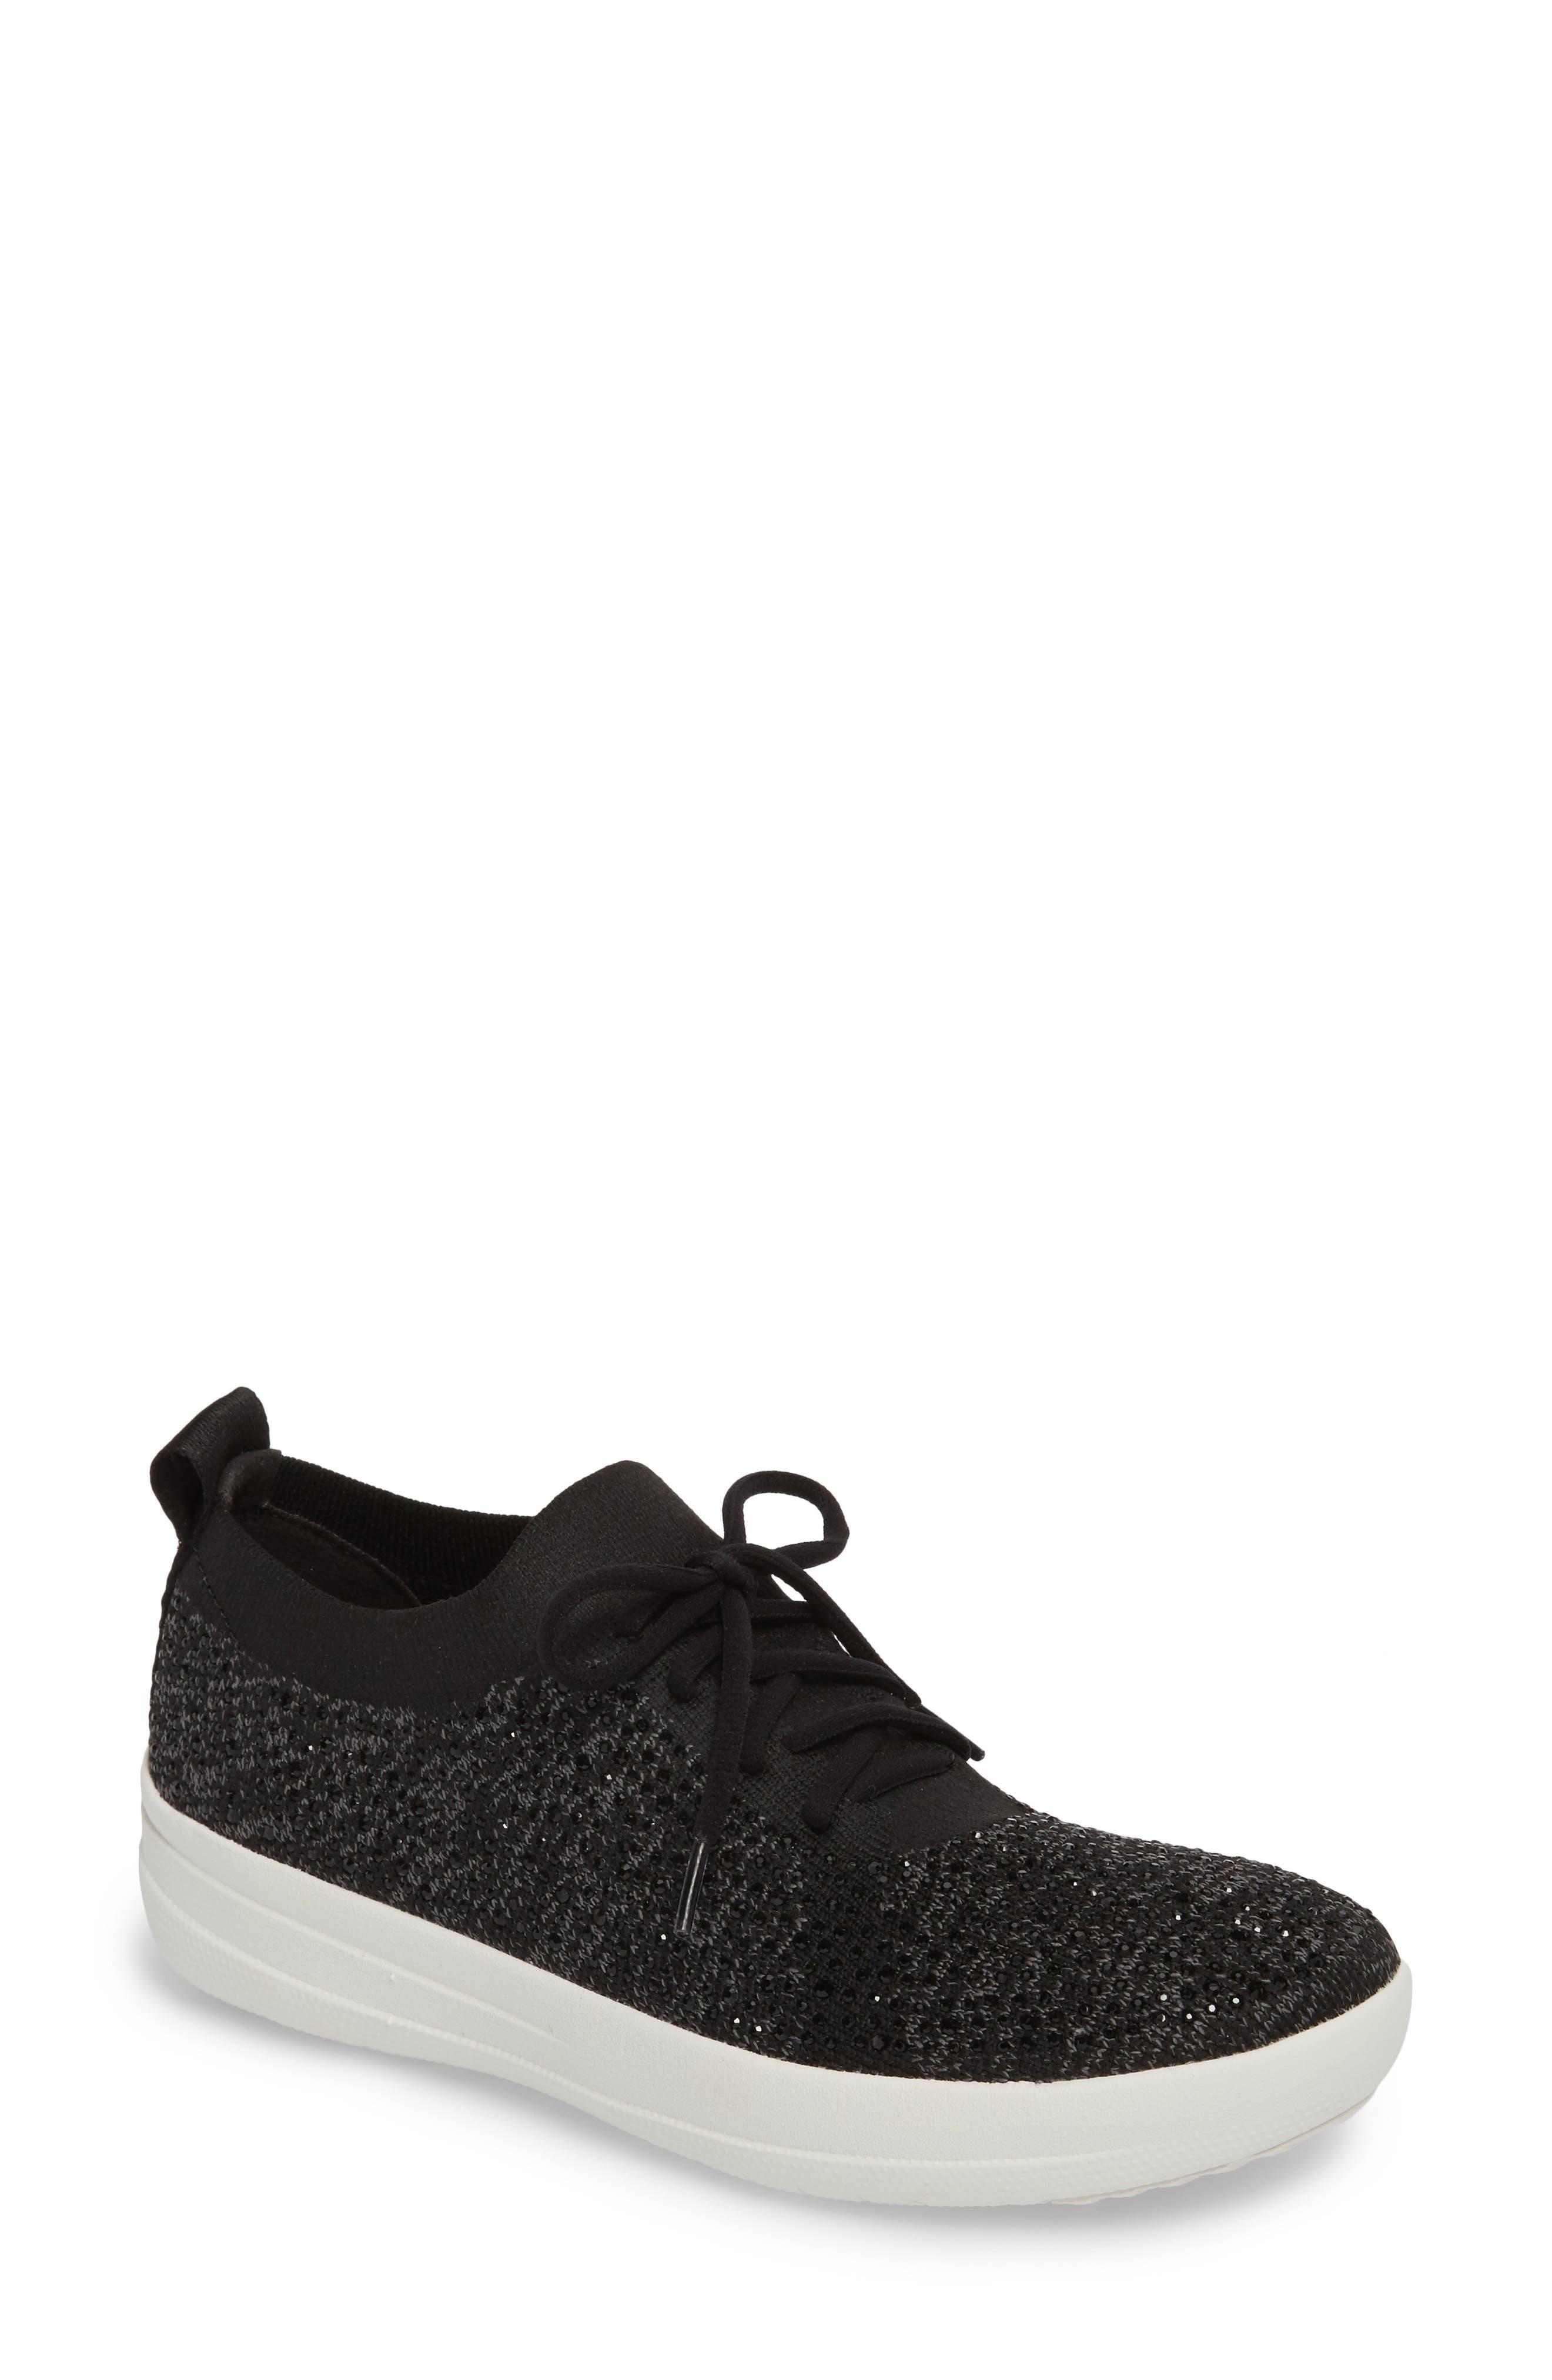 Uberknit<sup>™</sup> F-Sporty Sneaker,                             Main thumbnail 1, color,                             BLACK LEATHER